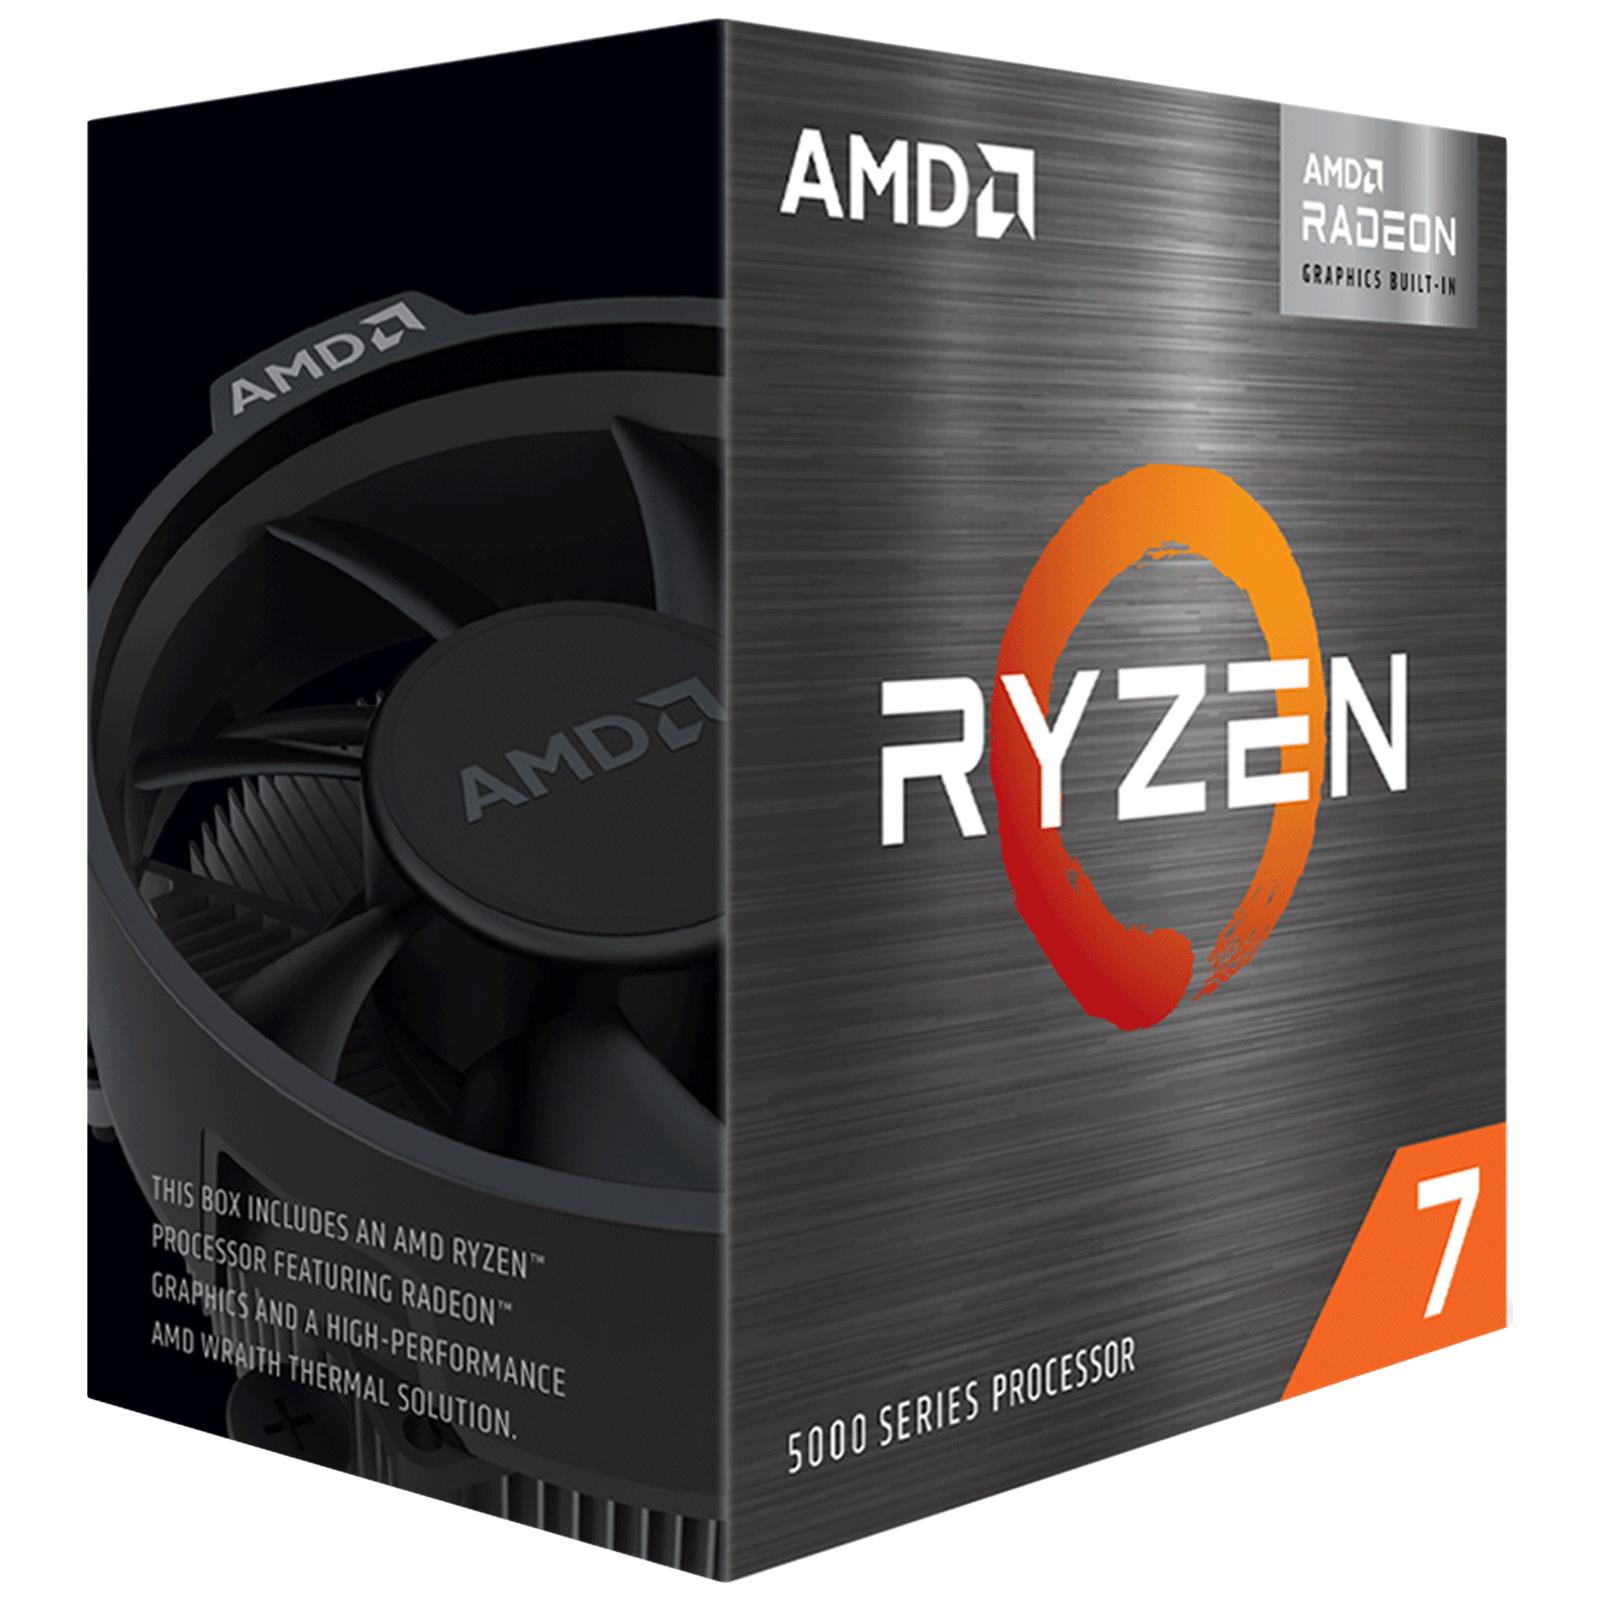 AMD Ryzen 7 Desktop Processor (8 Cores, 3.8 GHz, PCIe 3, 5700G, Silver)_1